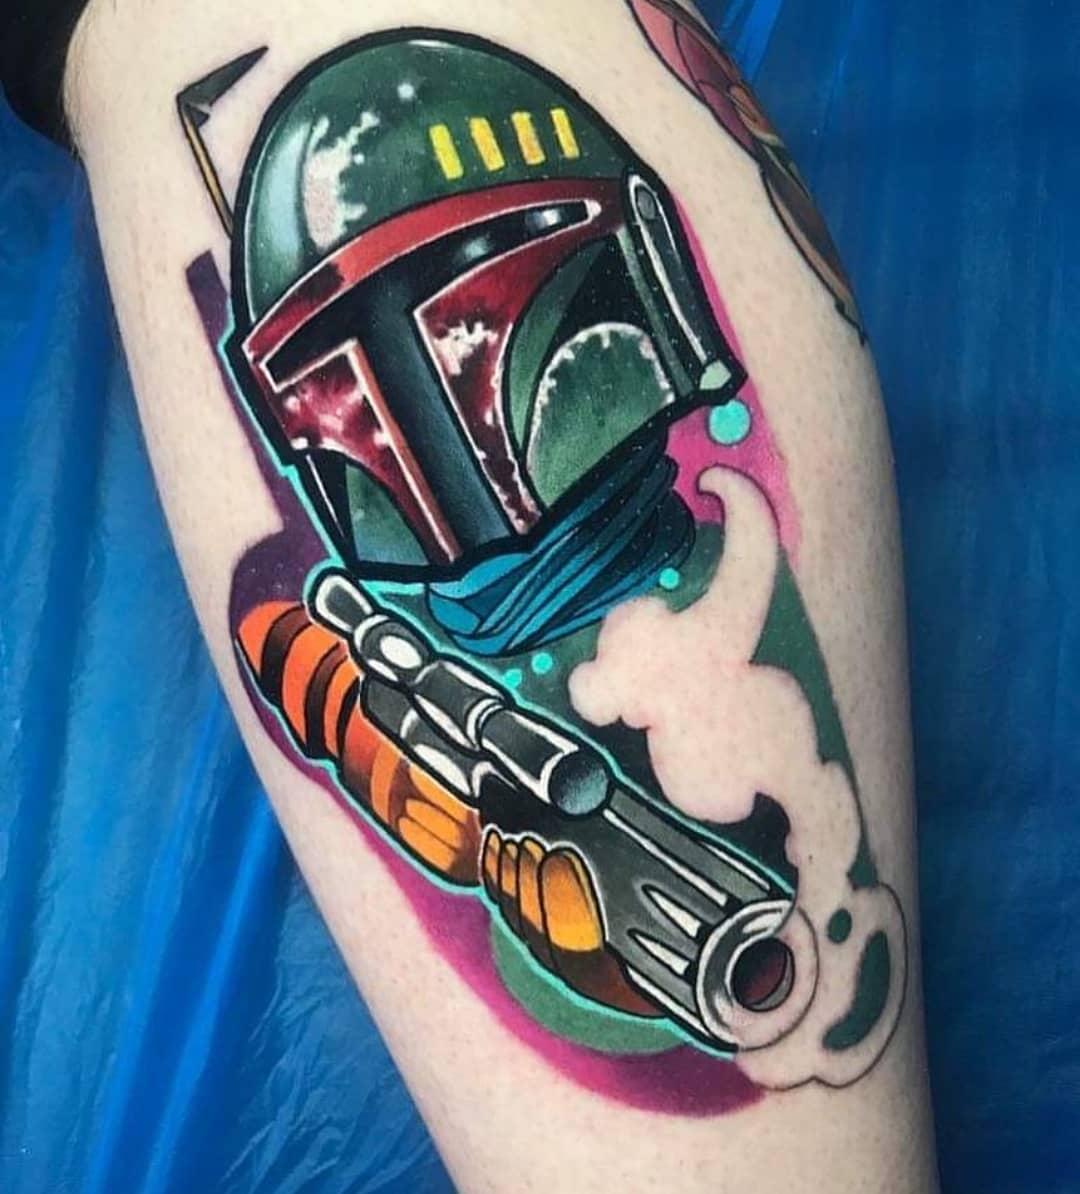 technicolor Mandalorian with gun tattoo